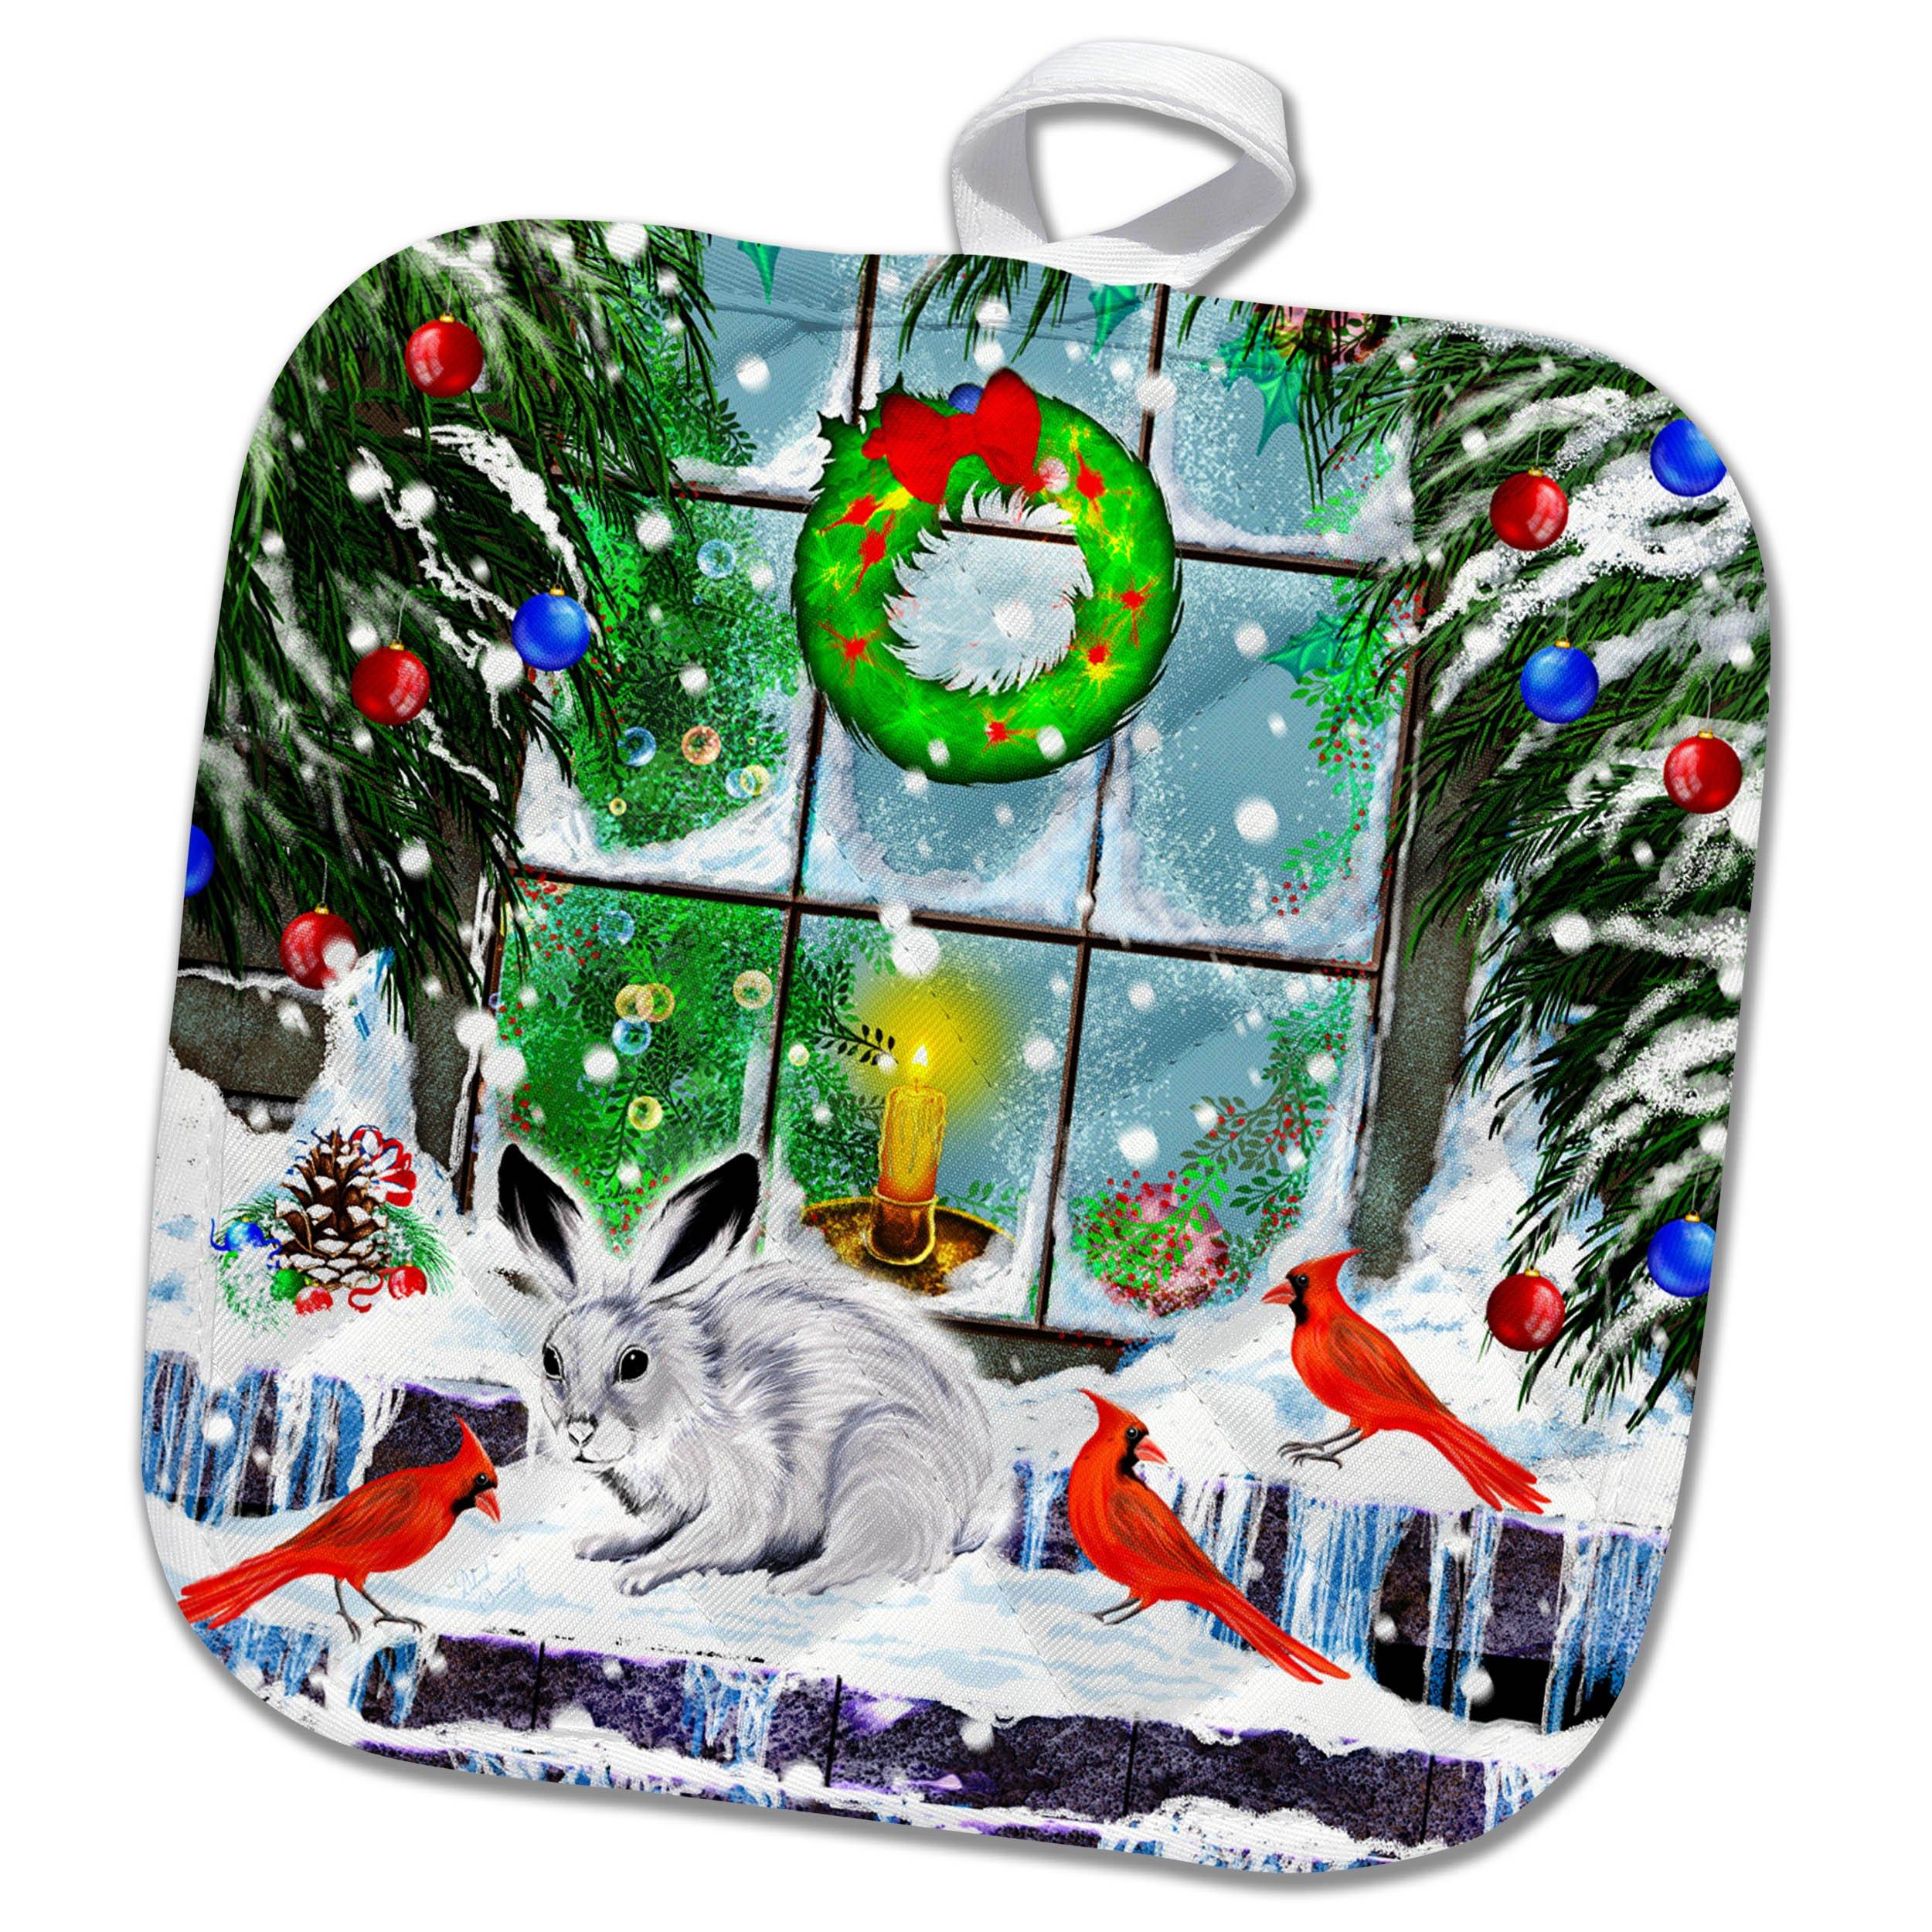 3dRose Dream Essence Designs-Holidays Christmas - A festive Christmas window scene with decorations, cardinals and bunny - 8x8 Potholder (phl_269502_1)